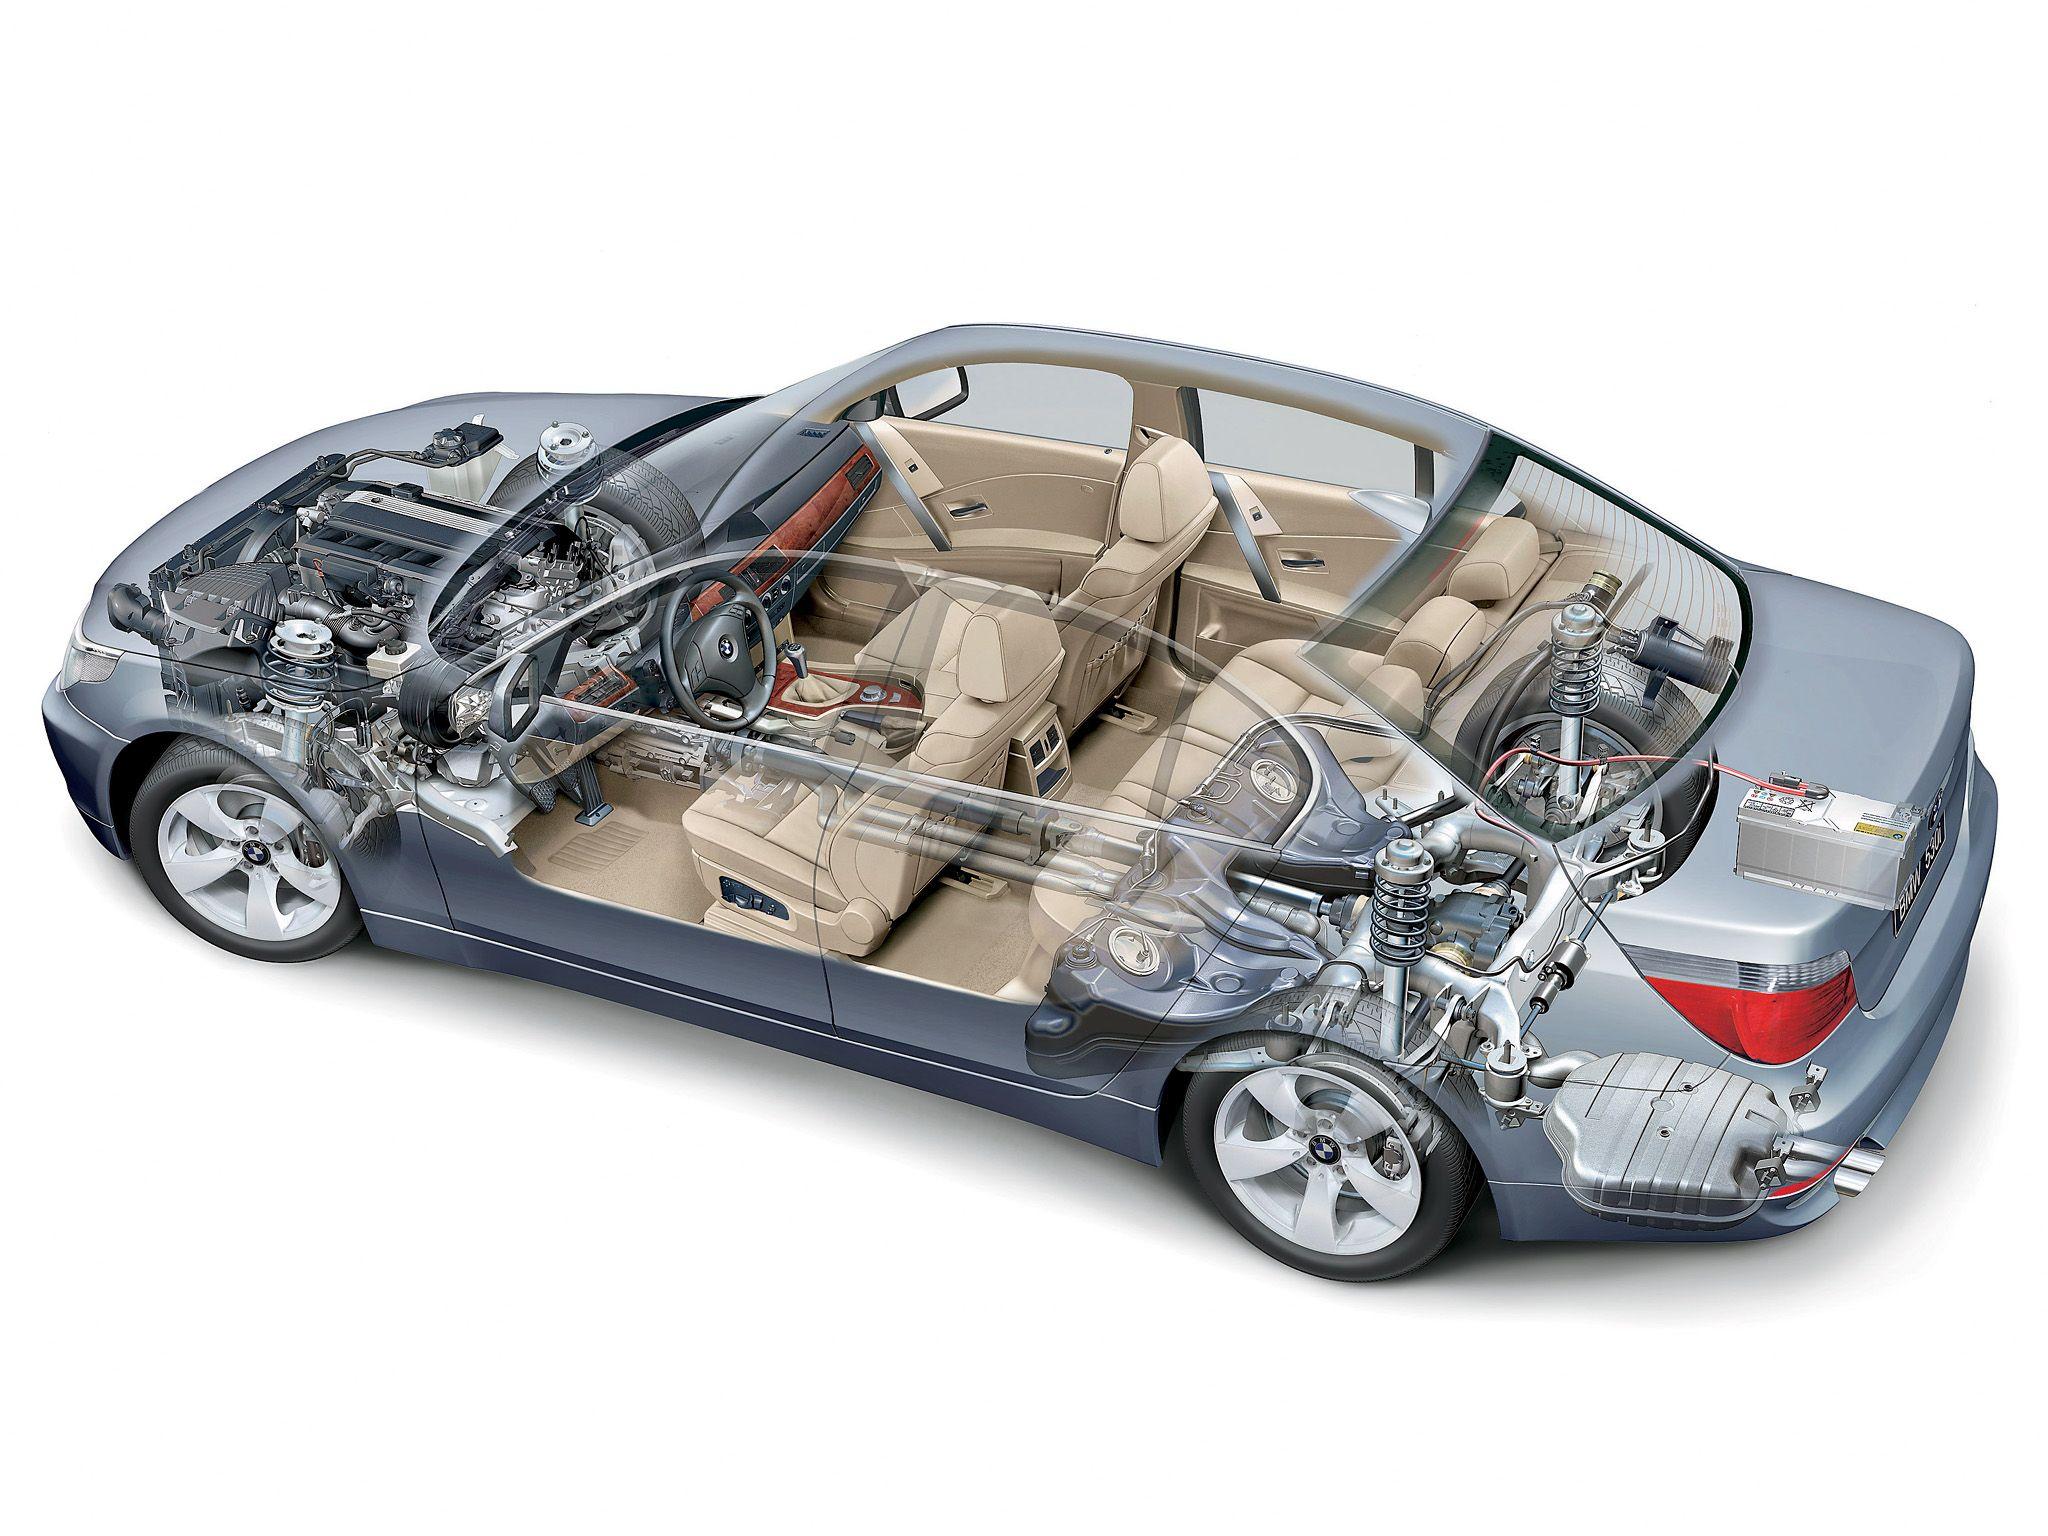 2003-2007 BMW 530i Sedan (E60) - Illustration unattributed ...